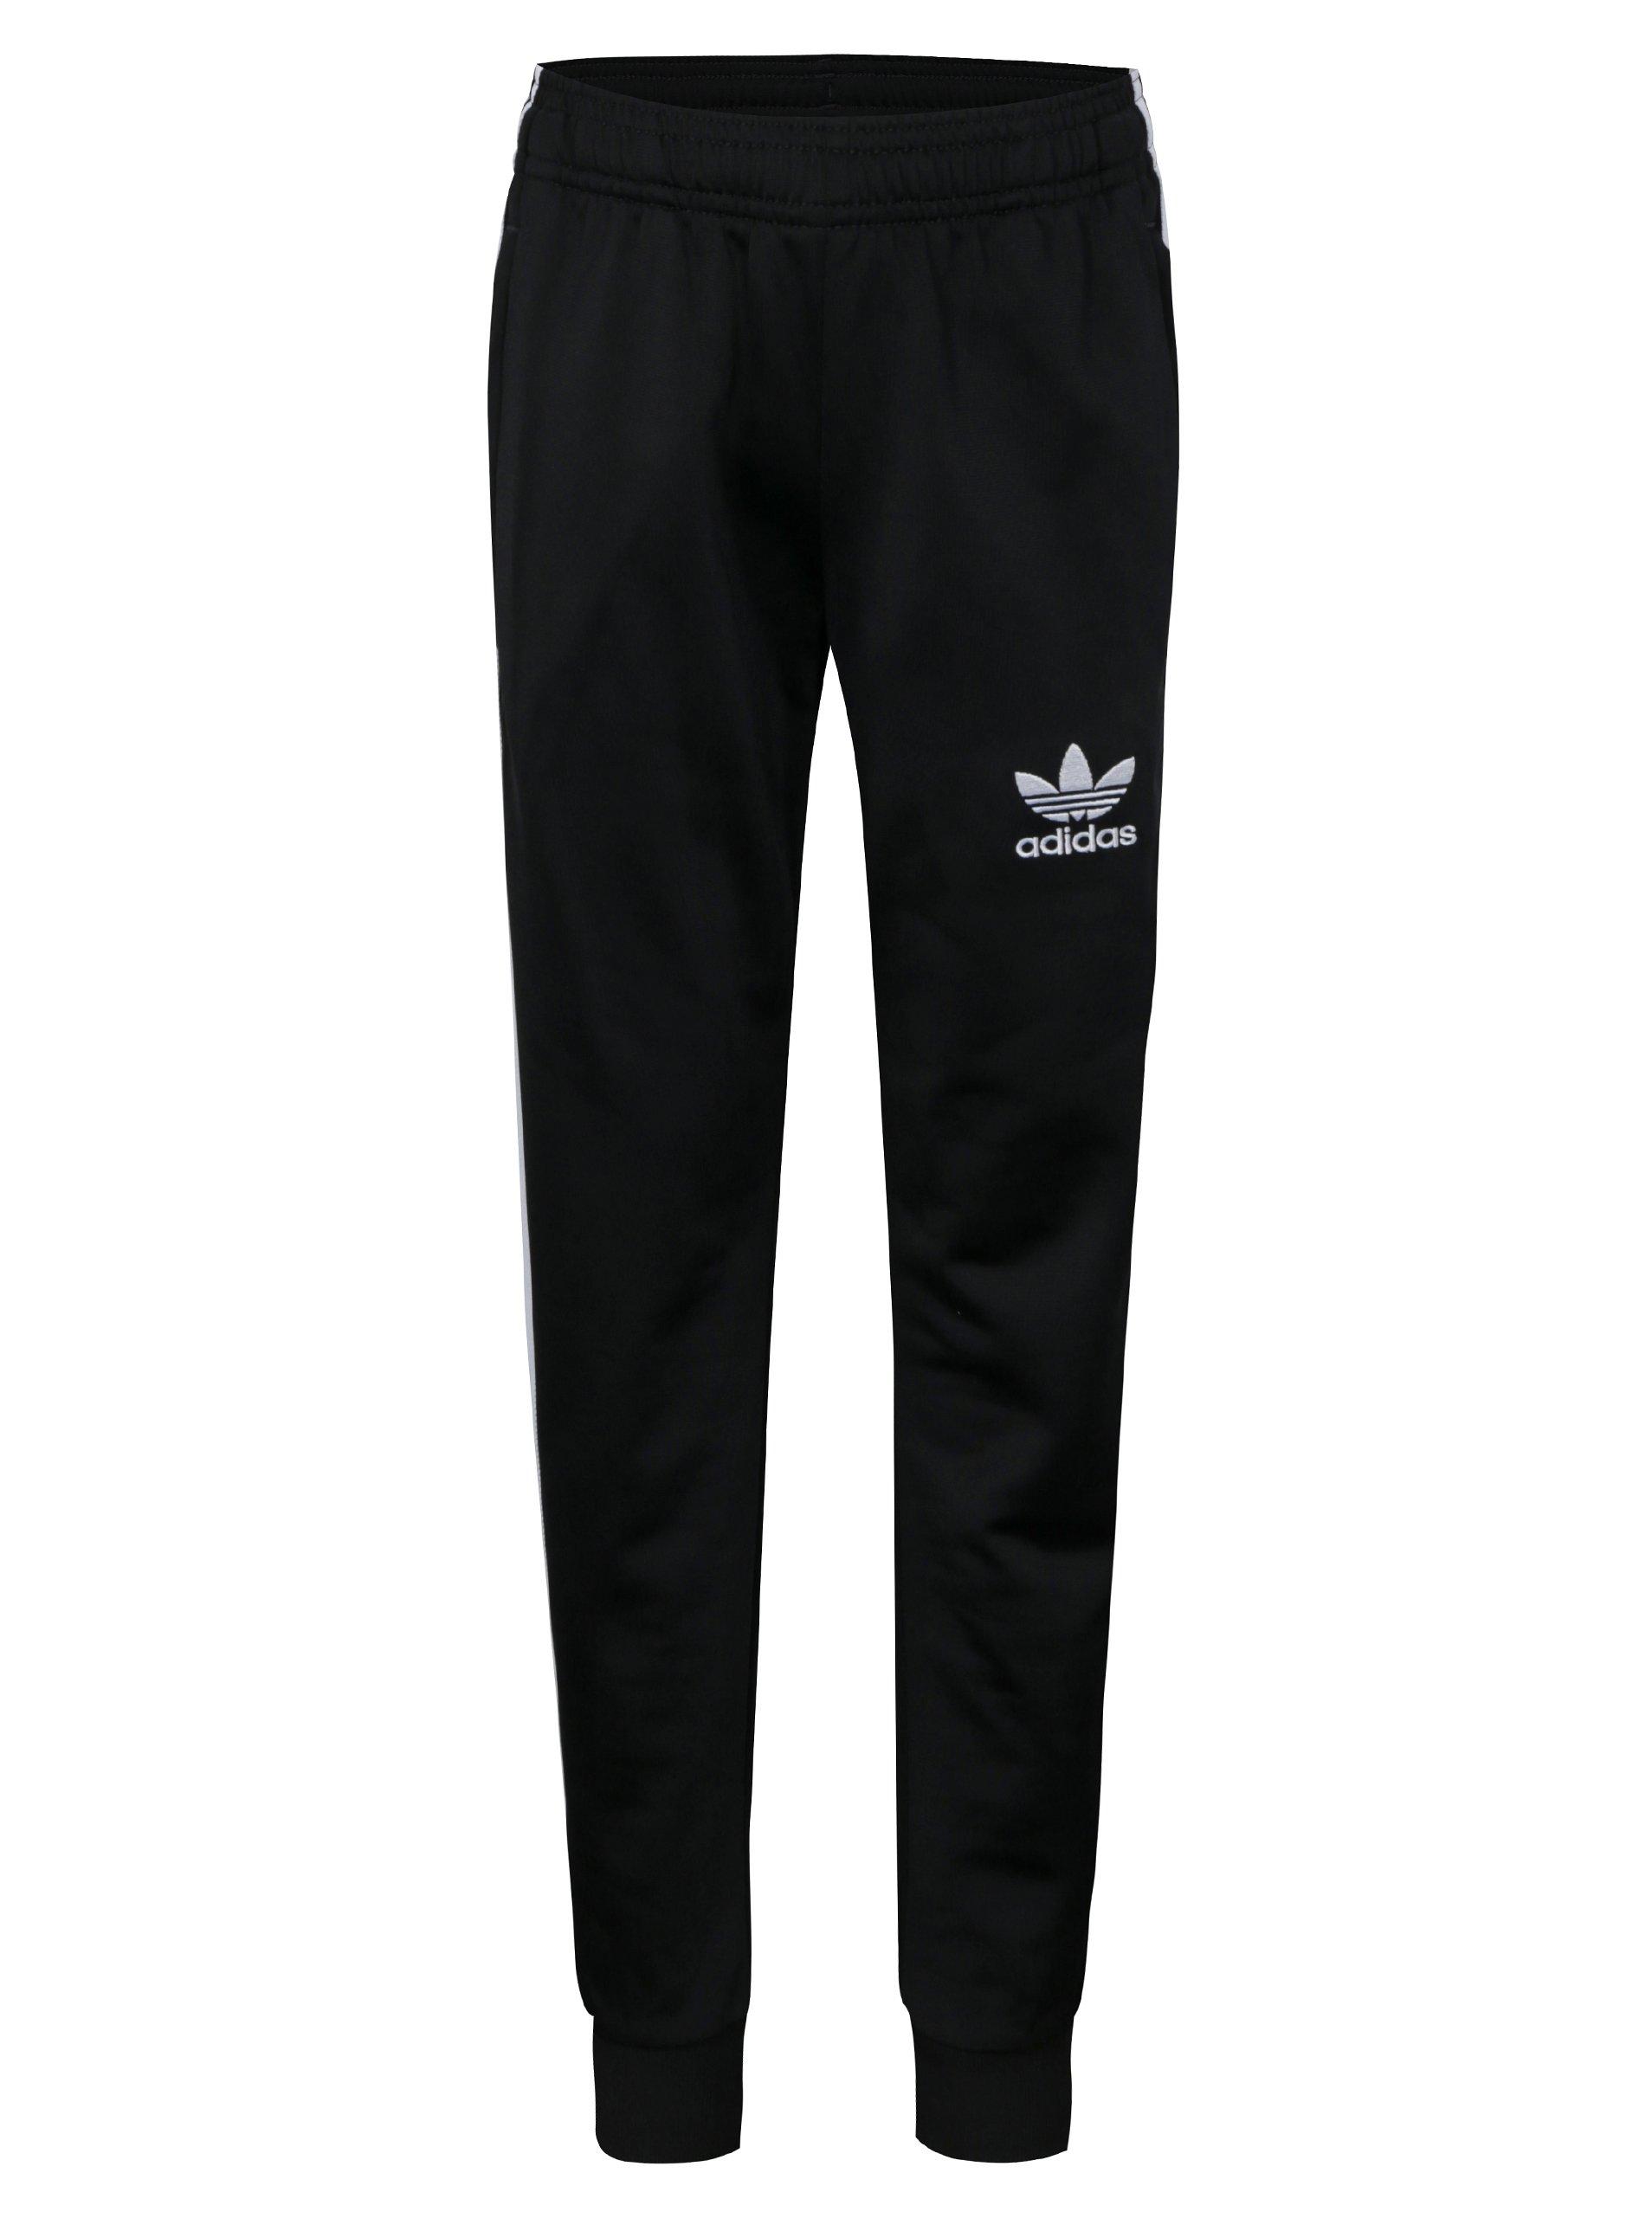 Čierne chlapčenské tepláky s bielymi pruhmi adidas Originals  217298e82d3